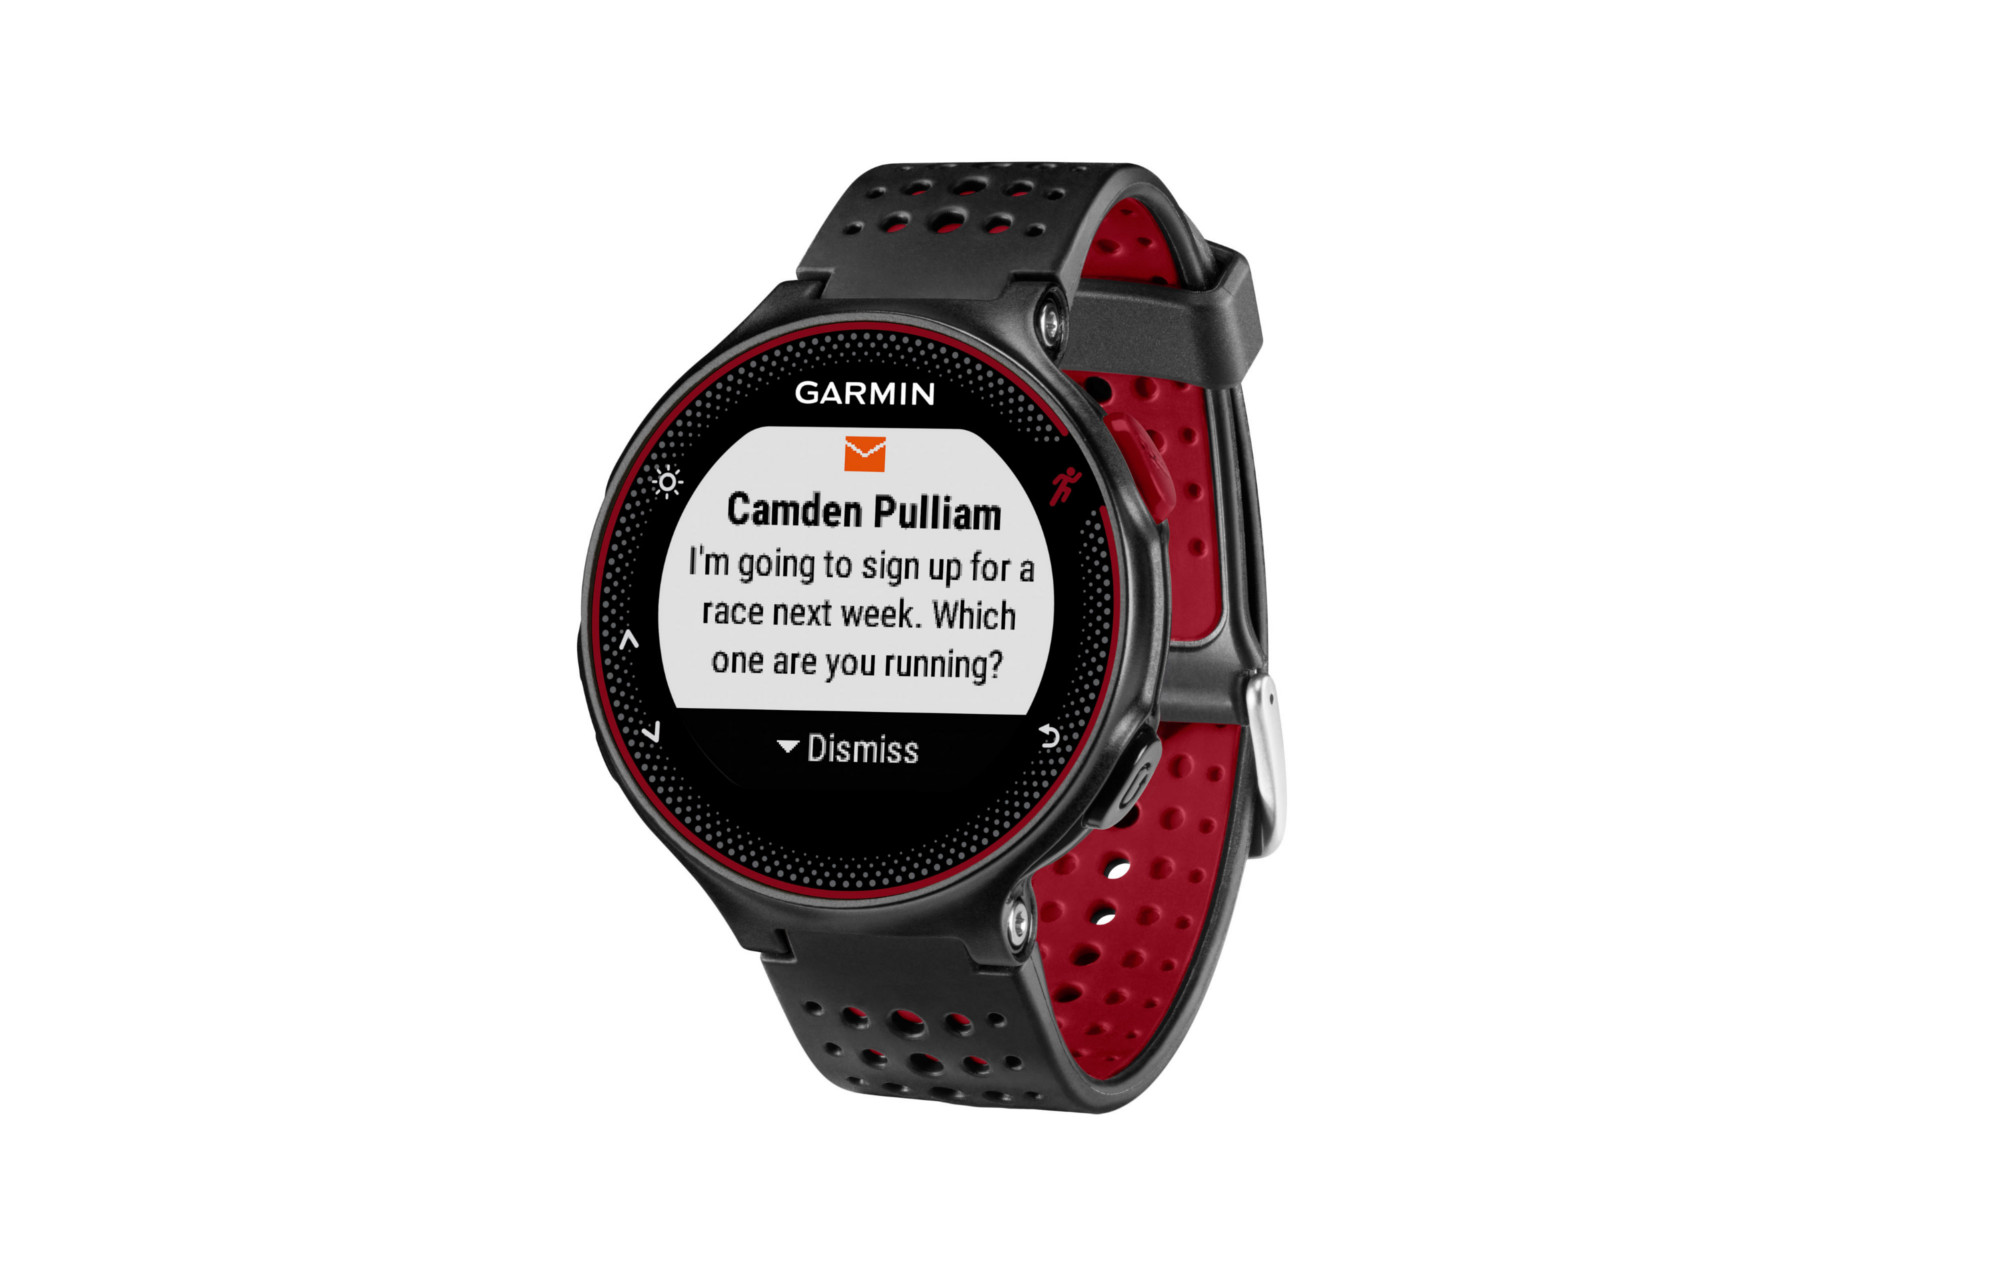 Watch with wrist hrm - Garmin Forerunner 235 Running Watch Integrated Hrm Black Red